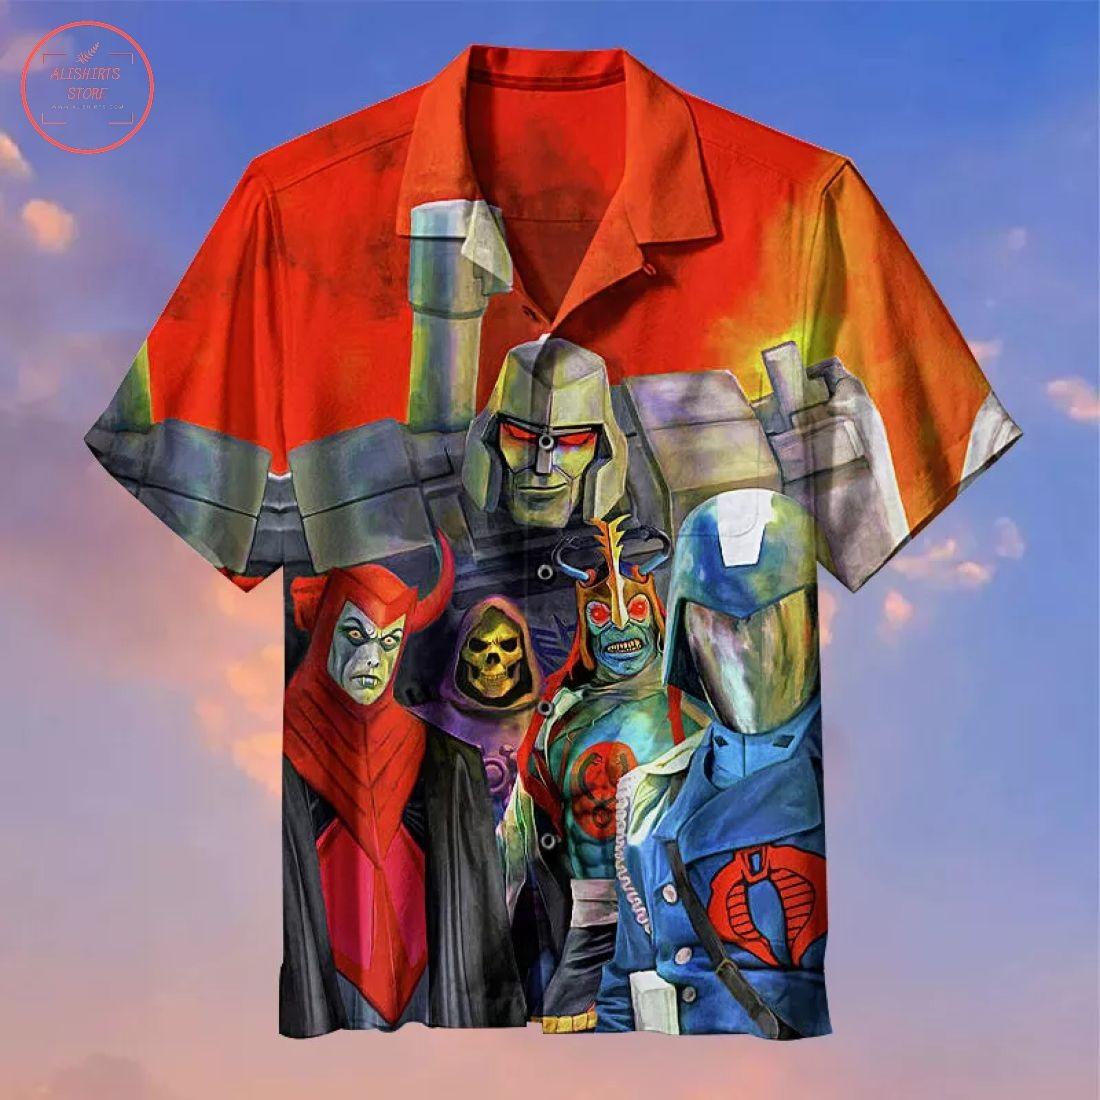 The villains in the 80s Hawaiian Shirt